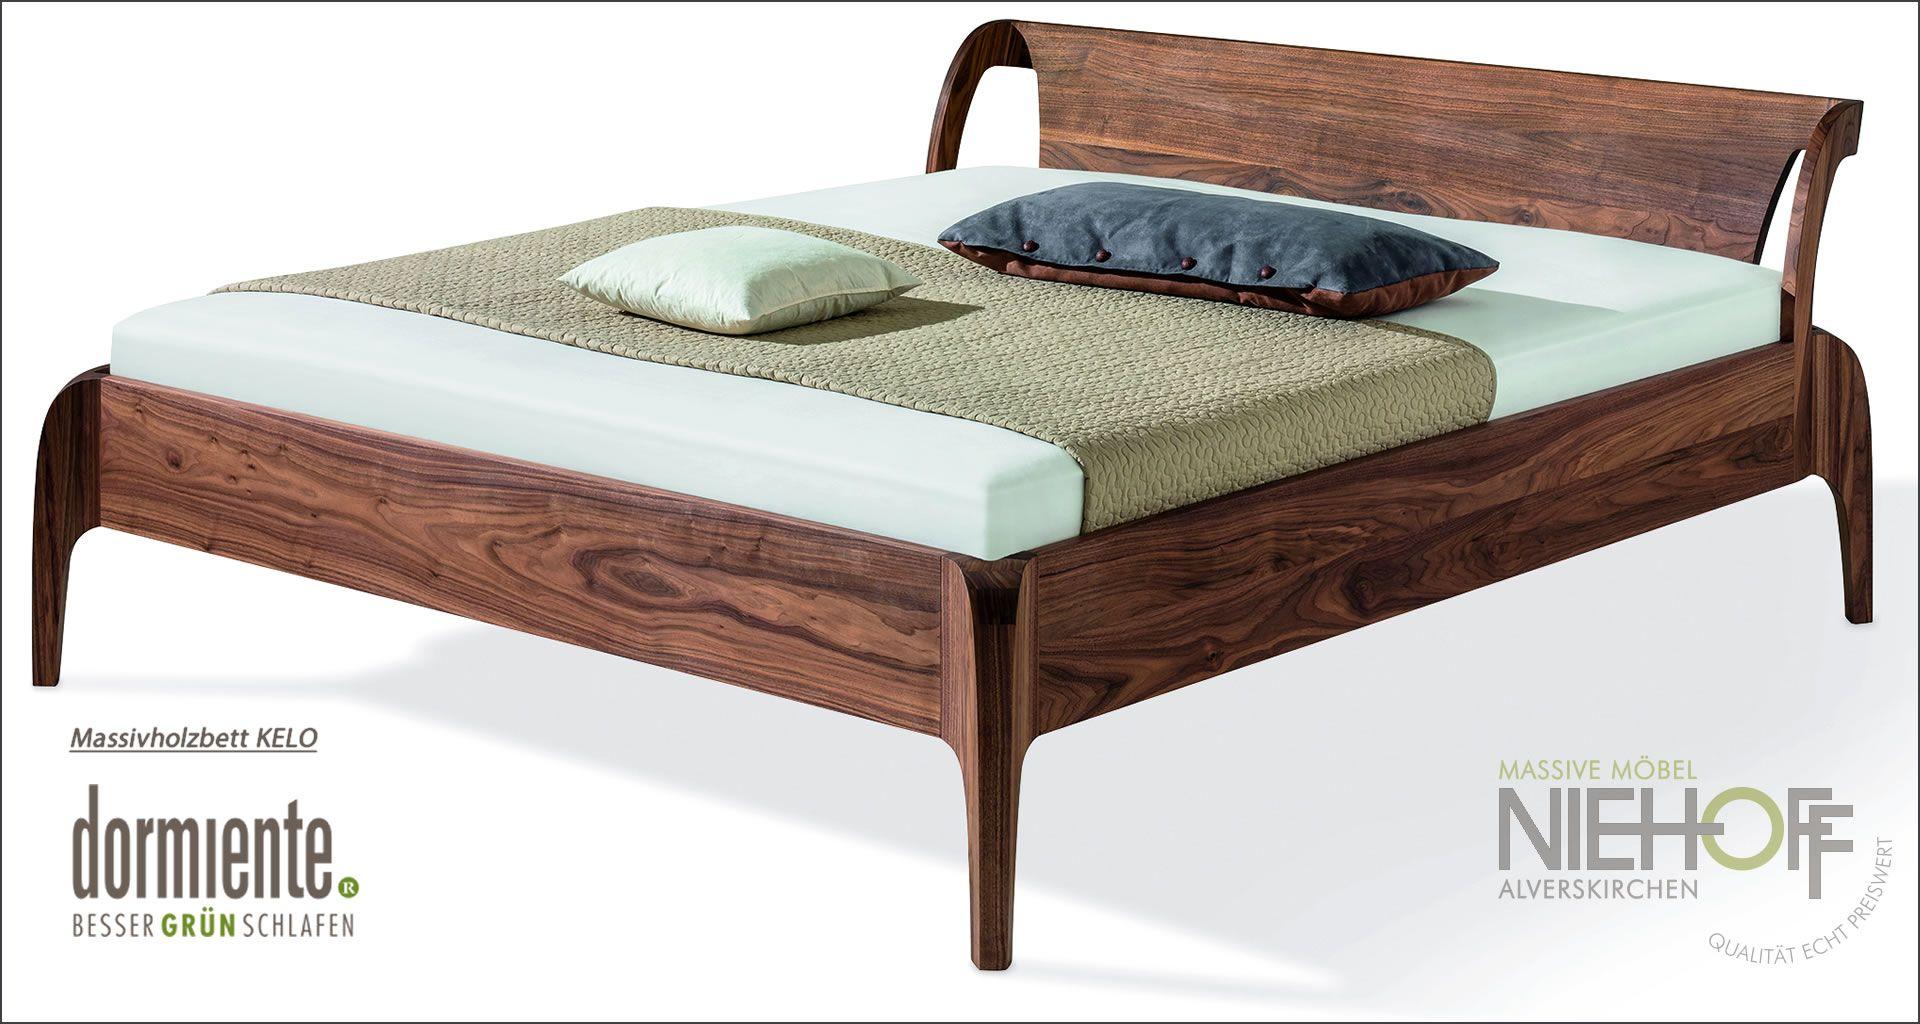 Massives Holzbett Einzelbett Doppelbett Kelo Von Dormiente